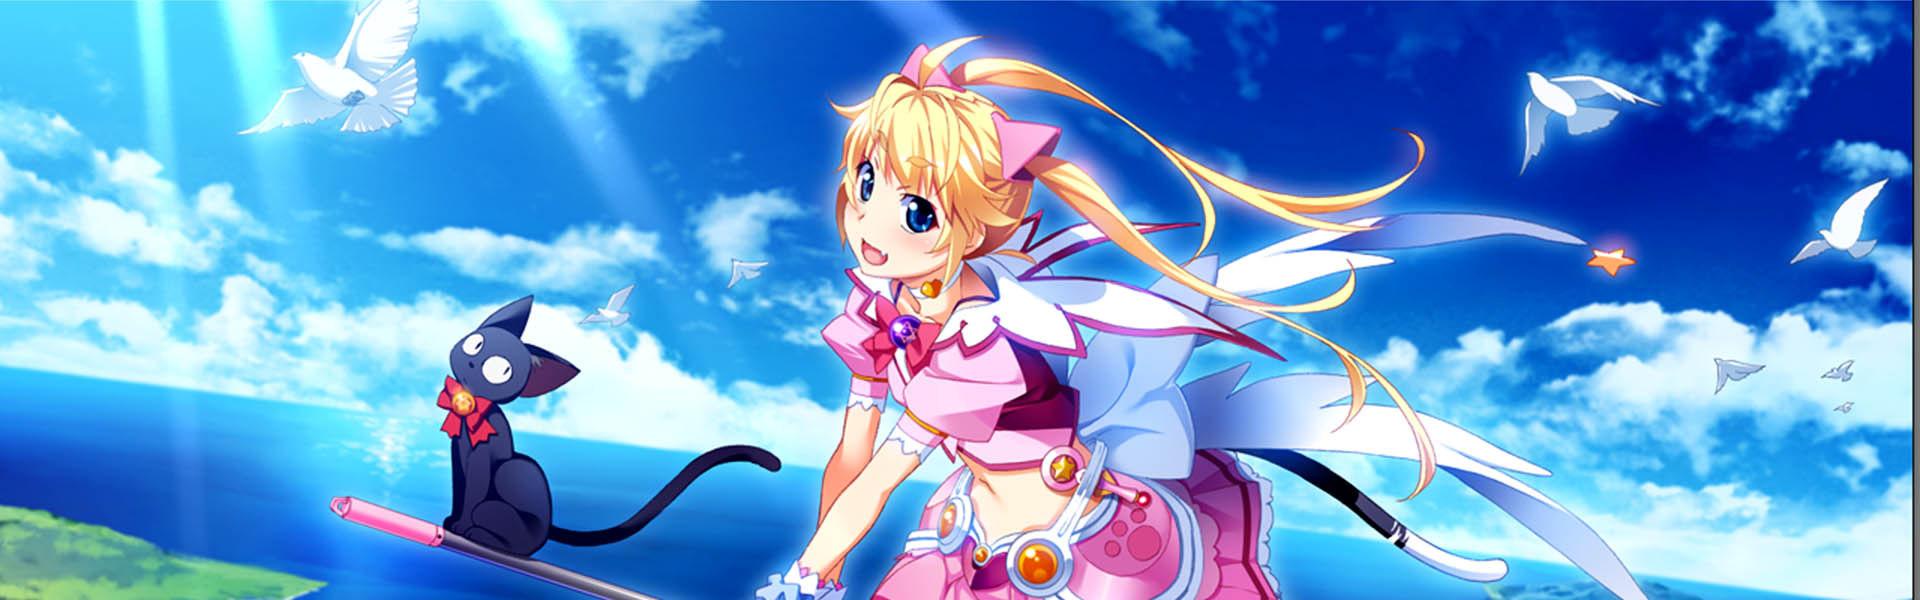 Idol Magical Girl Chiru Chiru Michiru Part 1 Steam Key GLOBAL